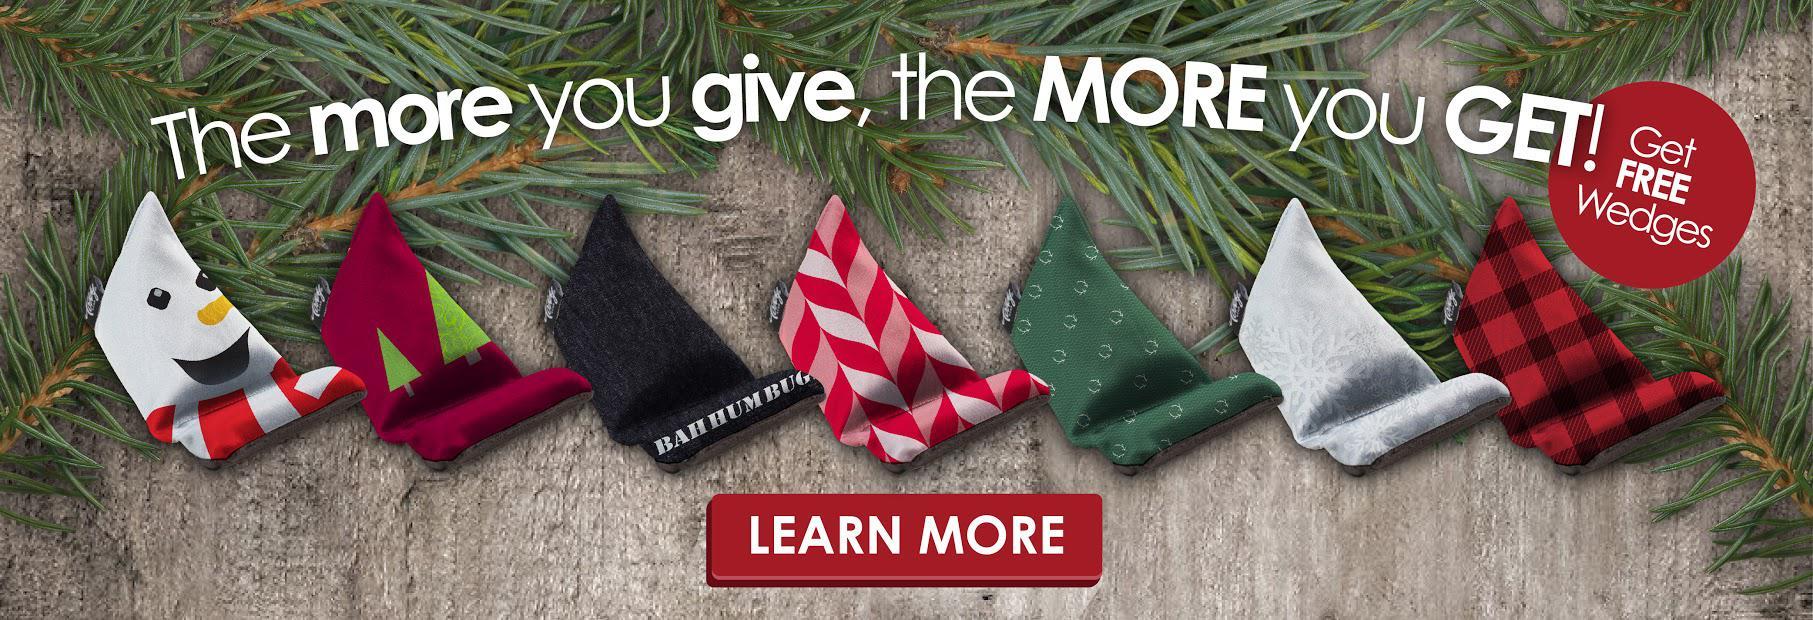 2015 Holiday Wedge Promotion